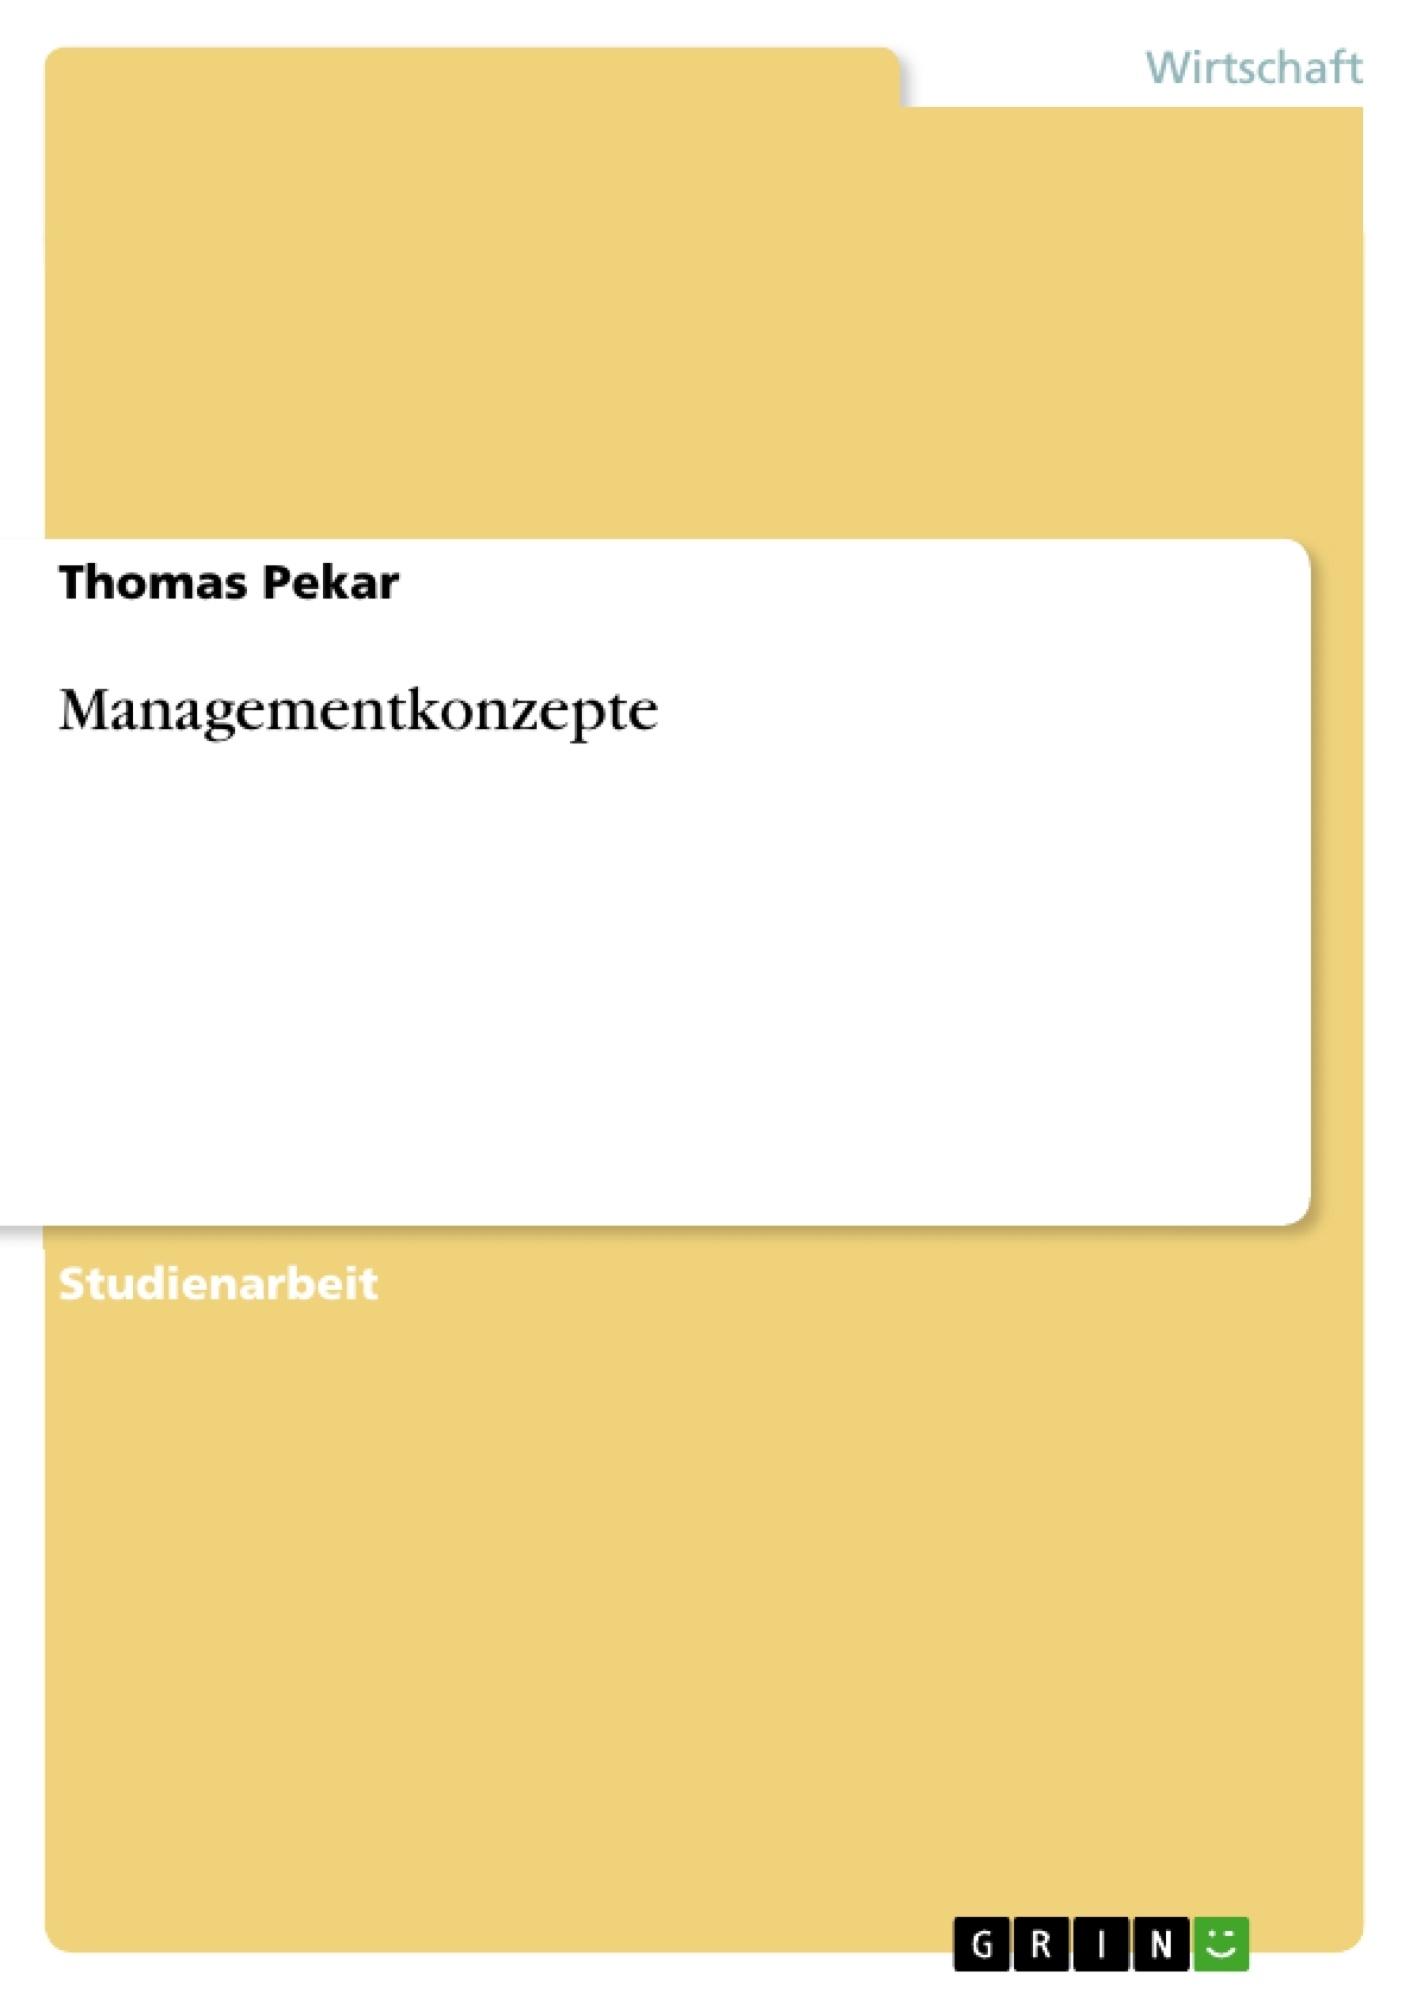 Titel: Managementkonzepte